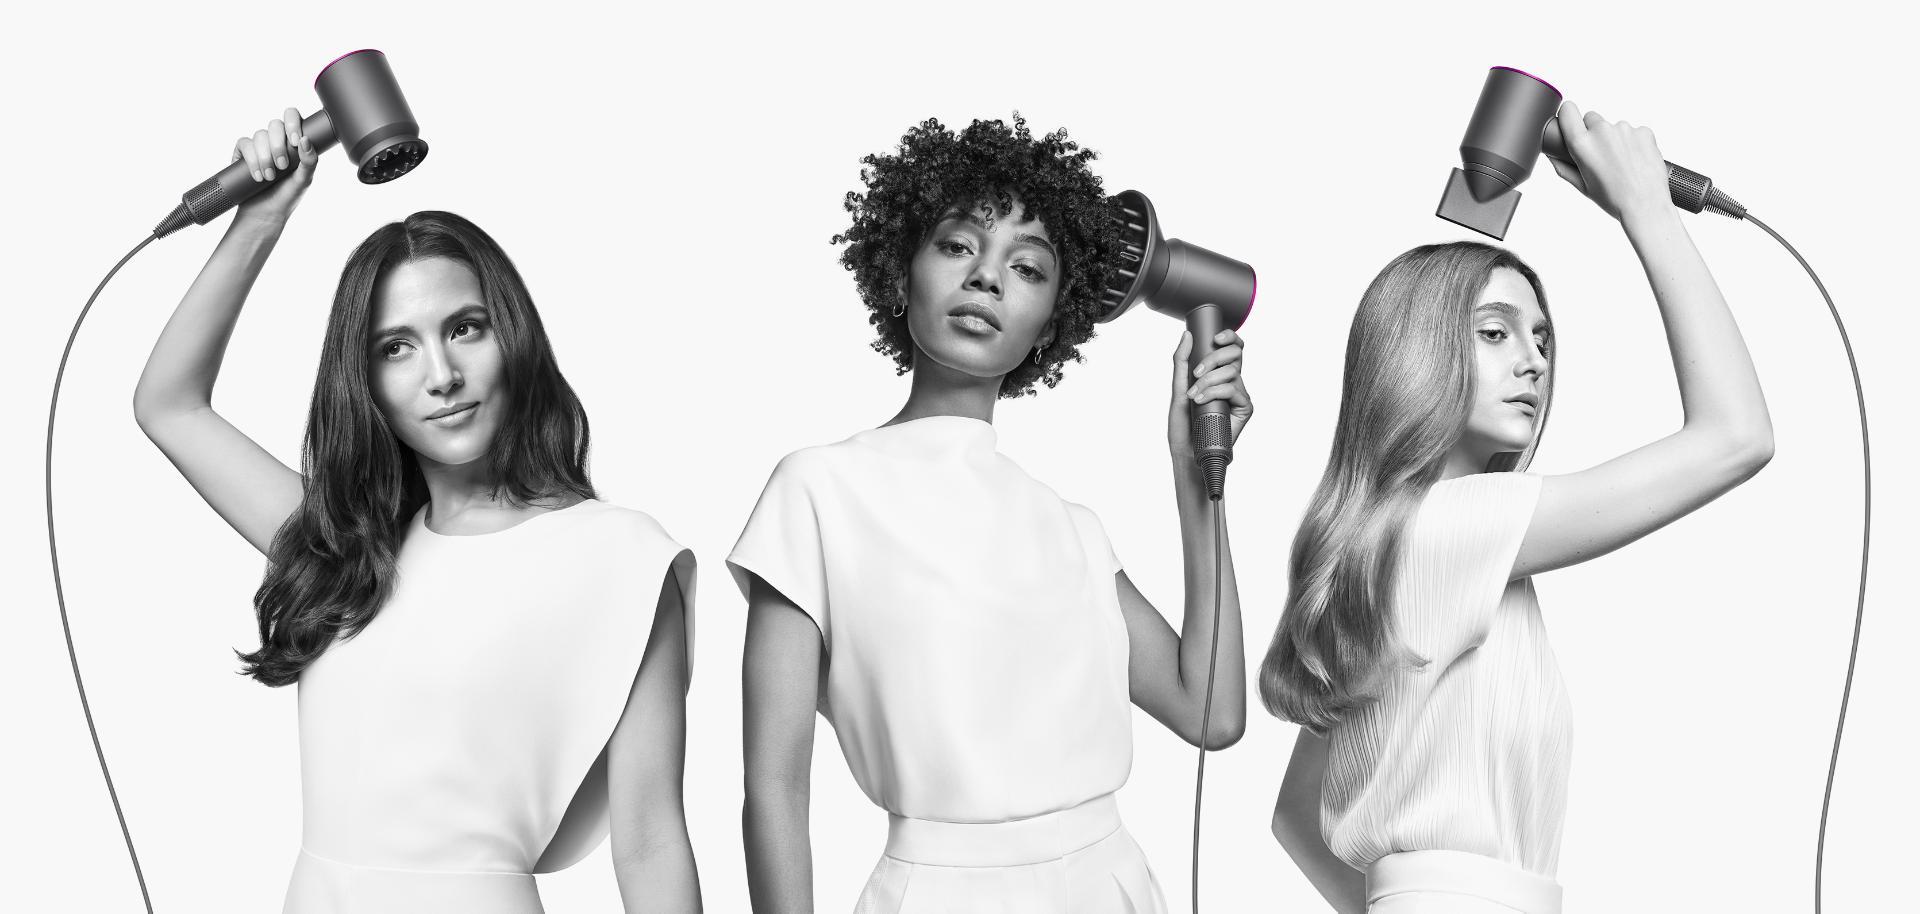 Tres modelos con distintos tipos de cabello utilizando distintos accesorios para peinar su cabello.